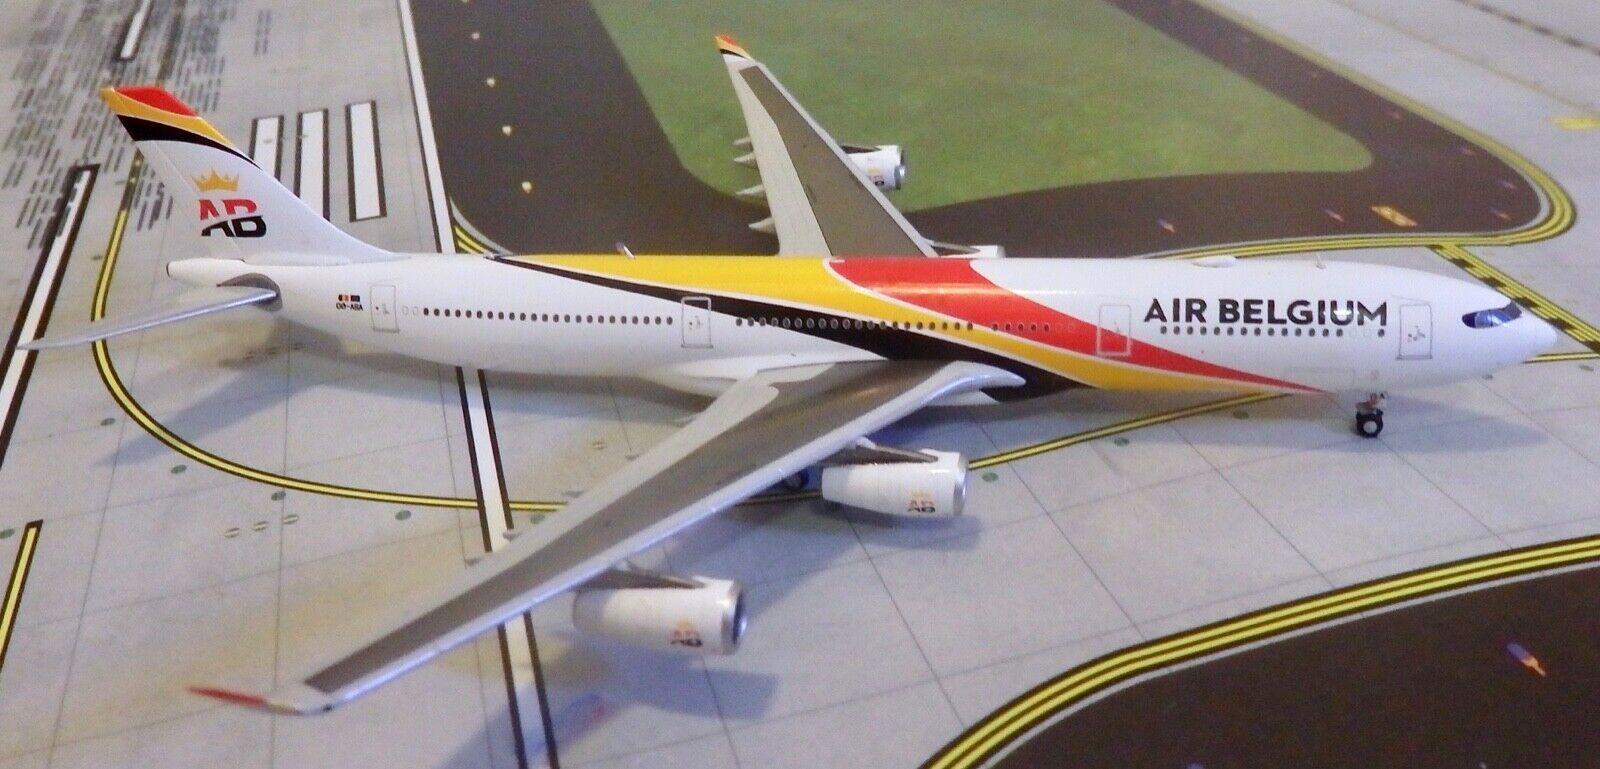 Air Belgium A340-300 Diecast Aircraft Model 1 400 400 400 Scale JC Wings XX4420 6fd54e